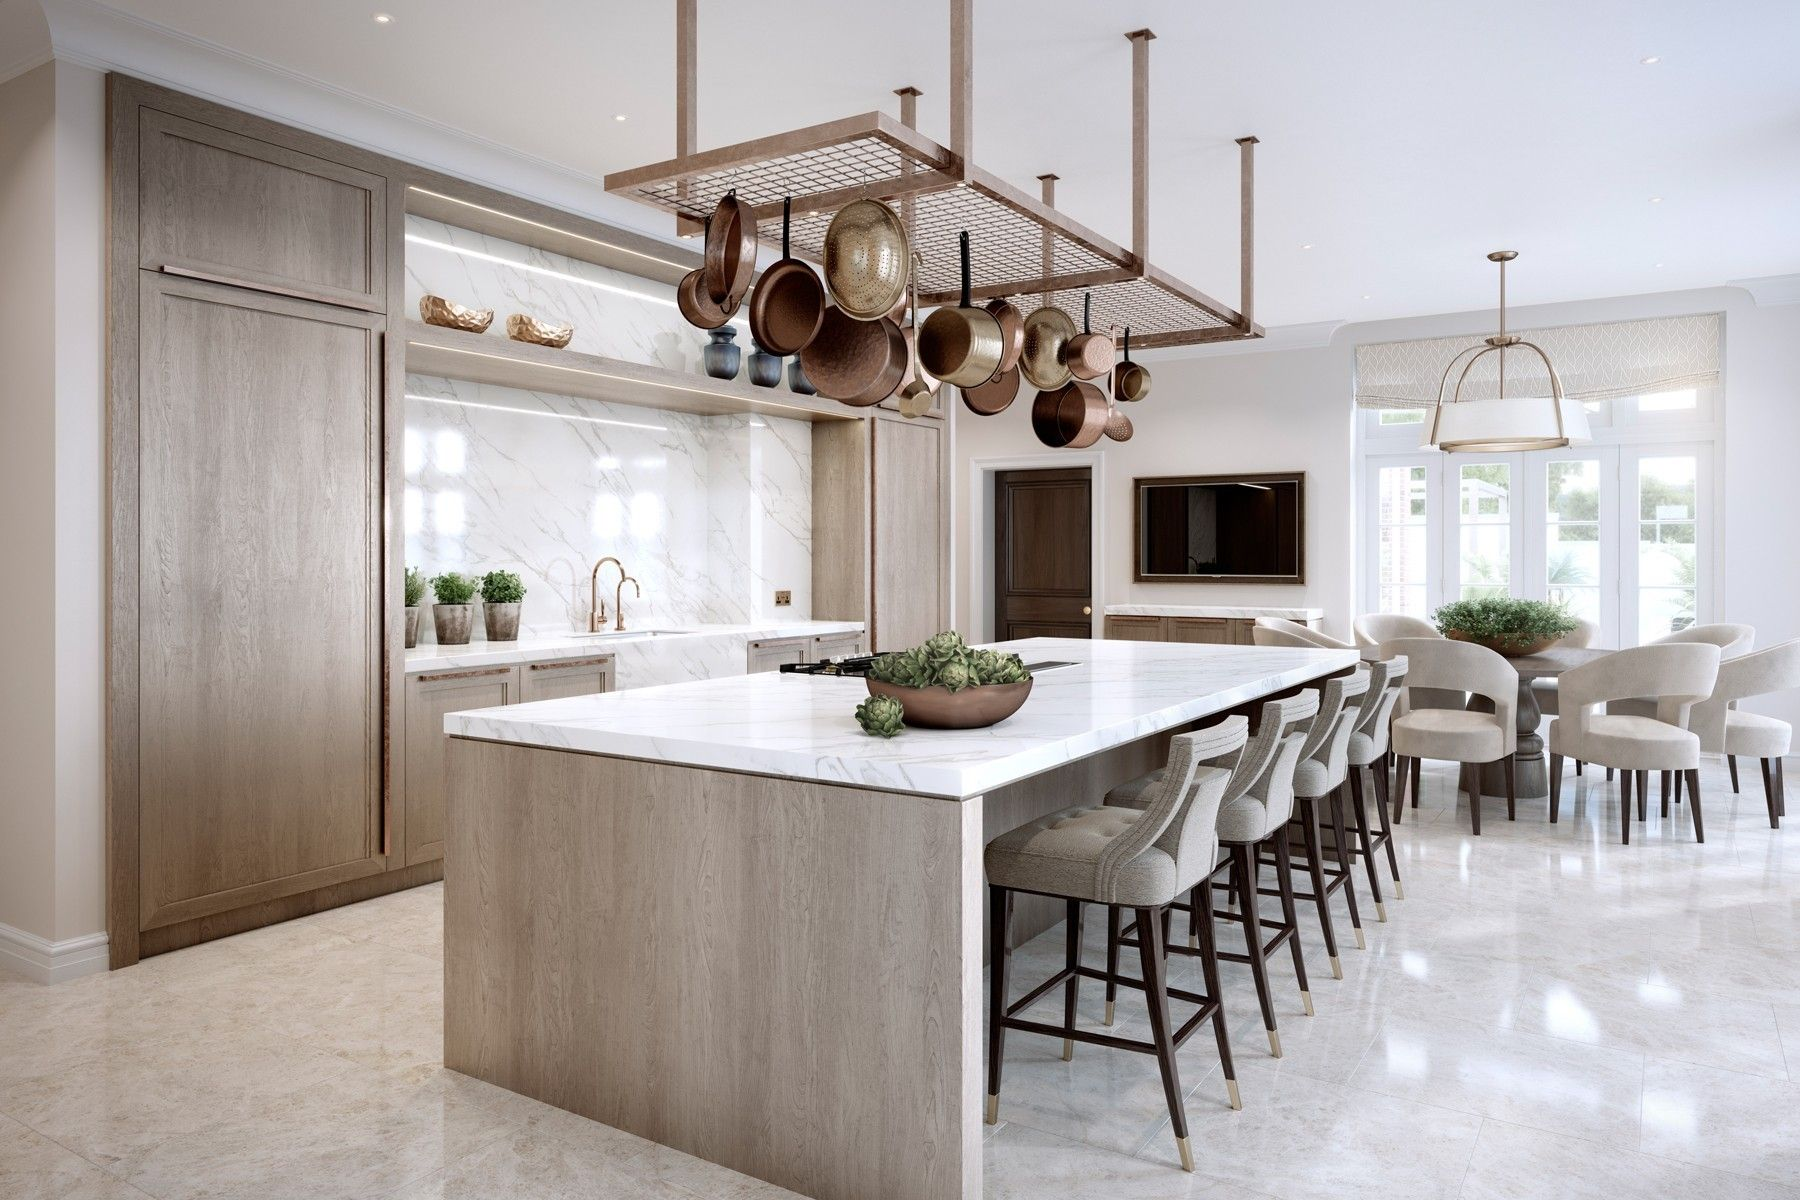 Kitchen seating ideas Surrey Family Home, Luxury Interior